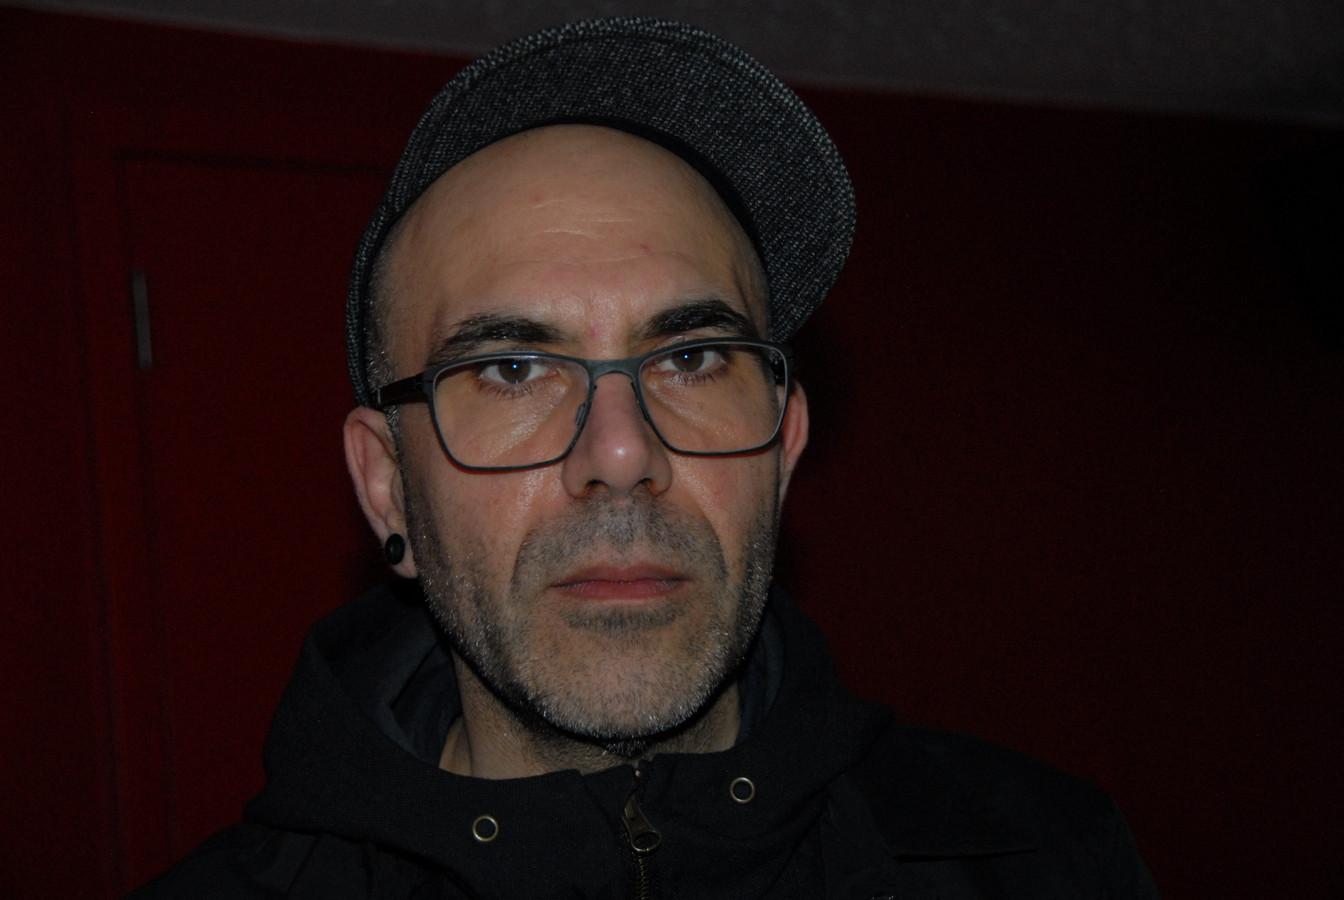 Rashad Becker